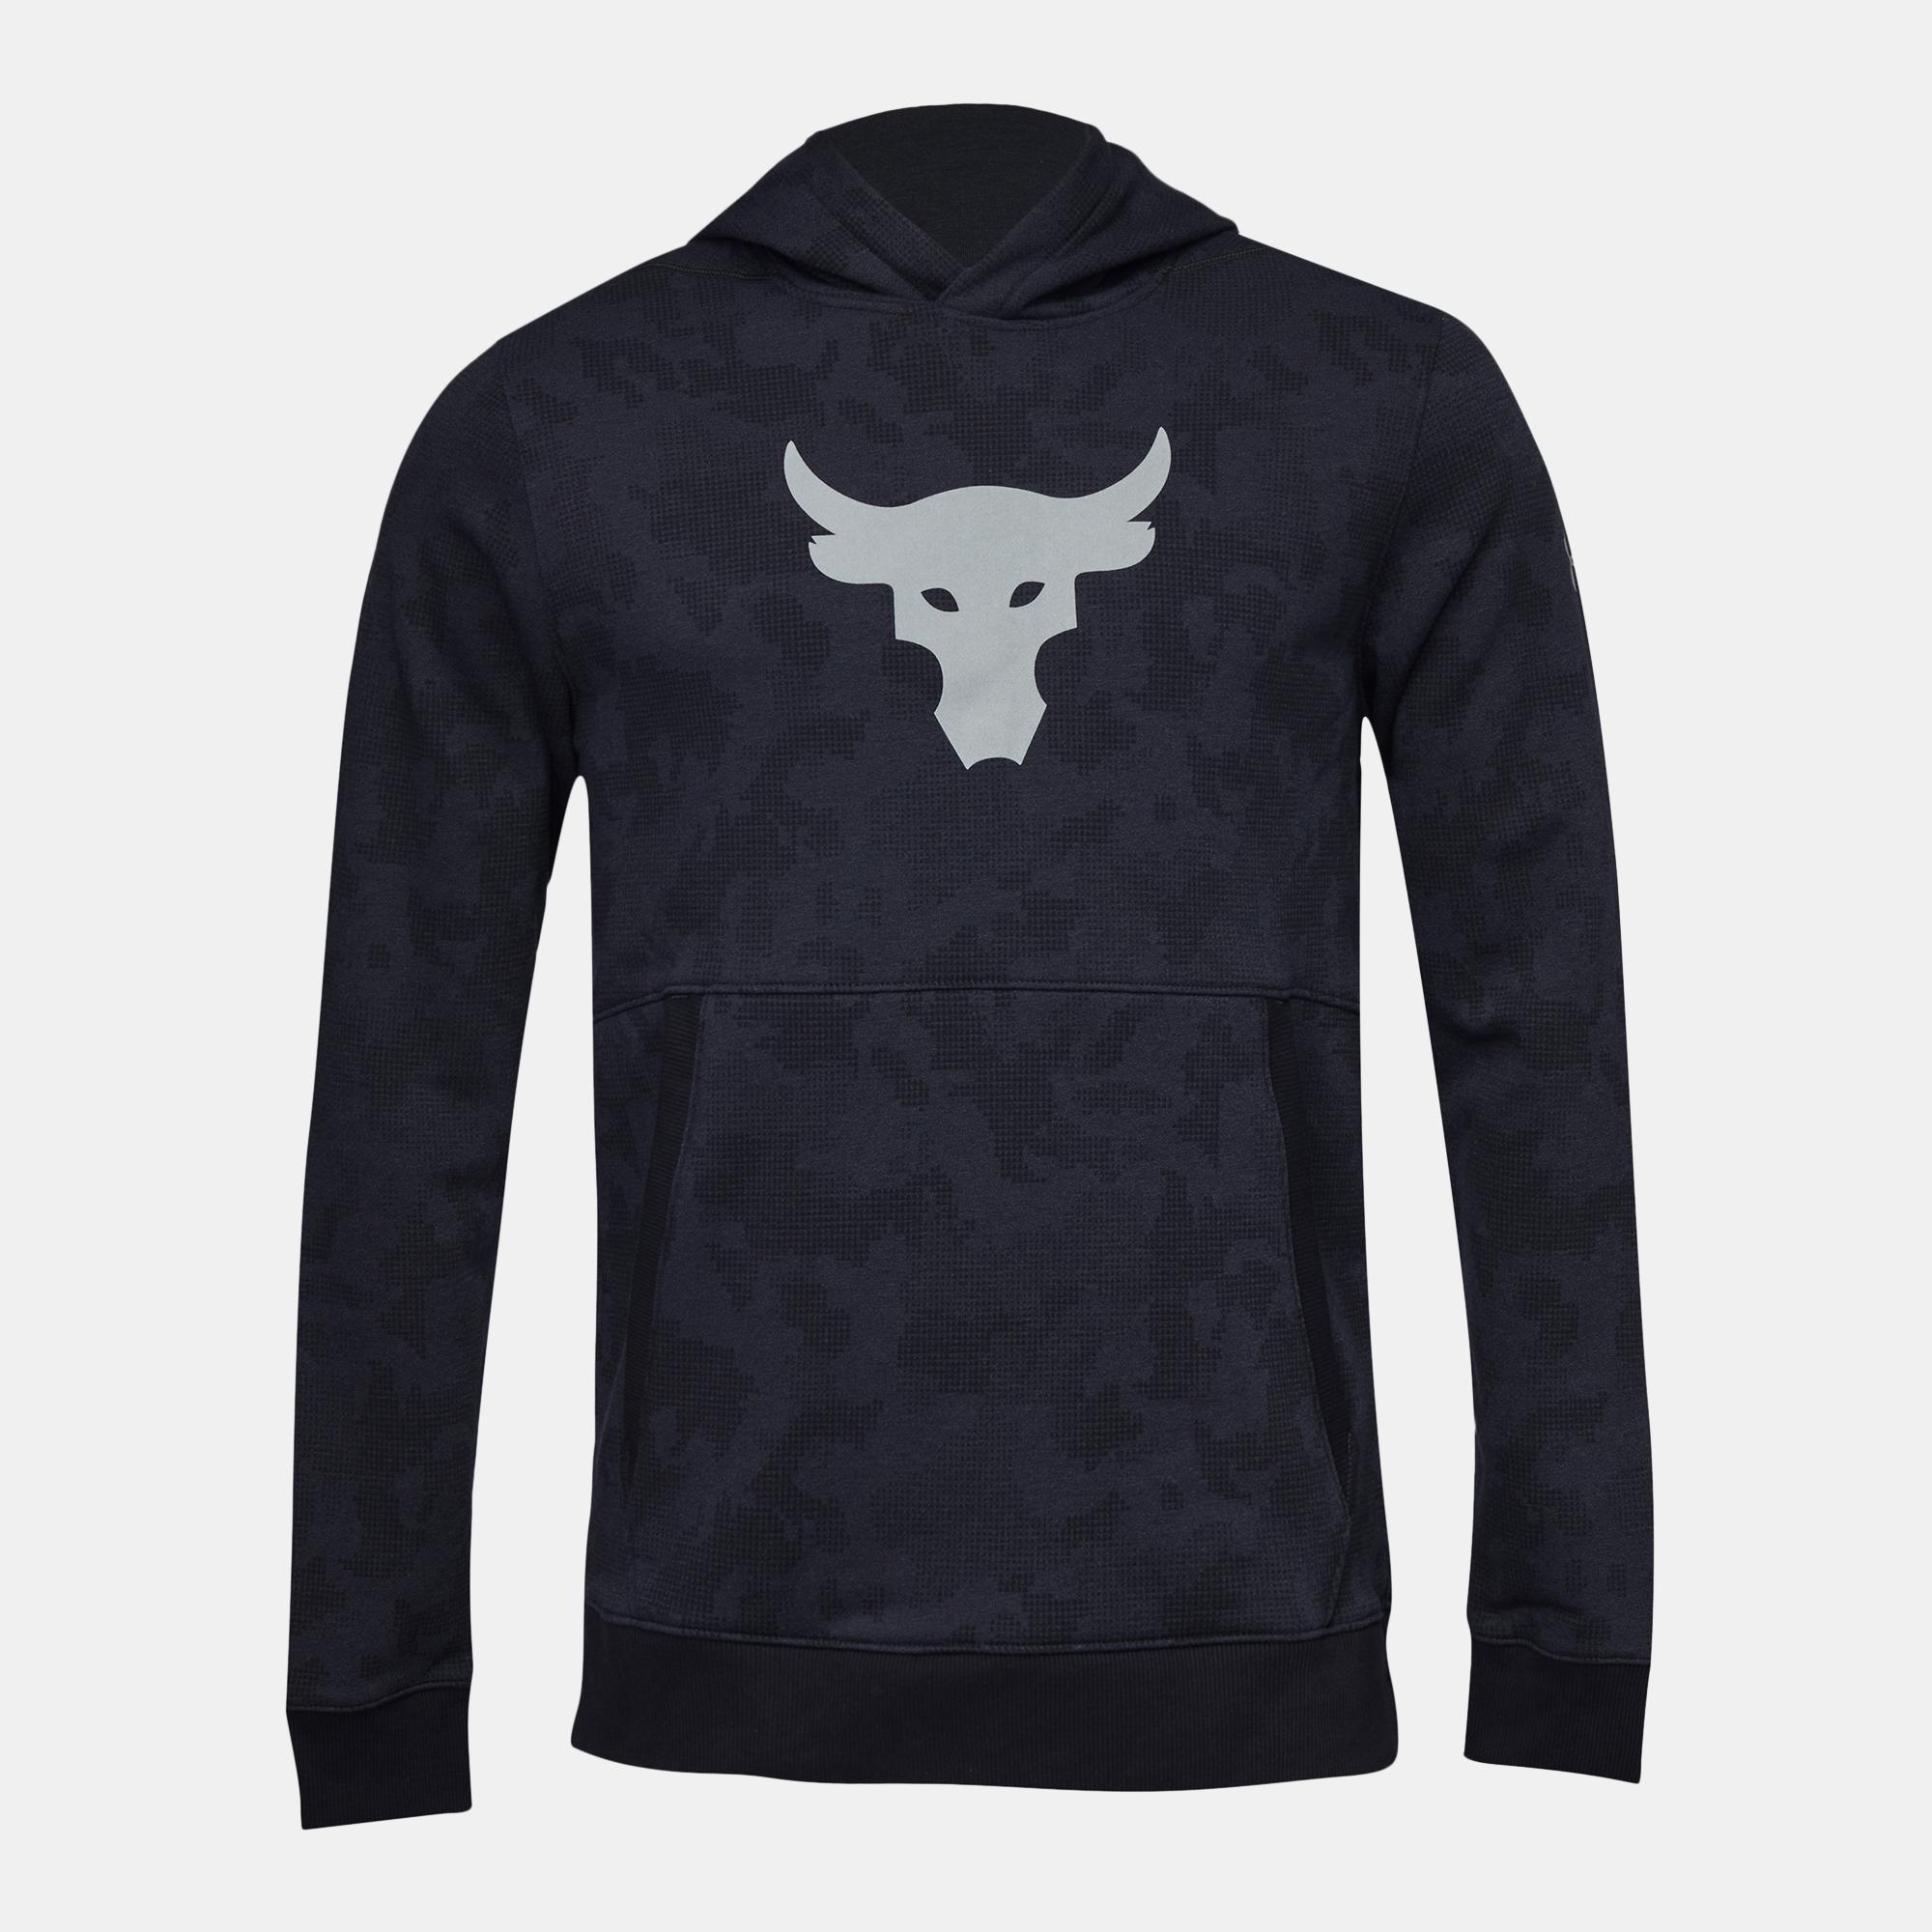 Shop Black Under Armour Project Rock UA Threadborne Fleece Hoodie ... 78835605fe9